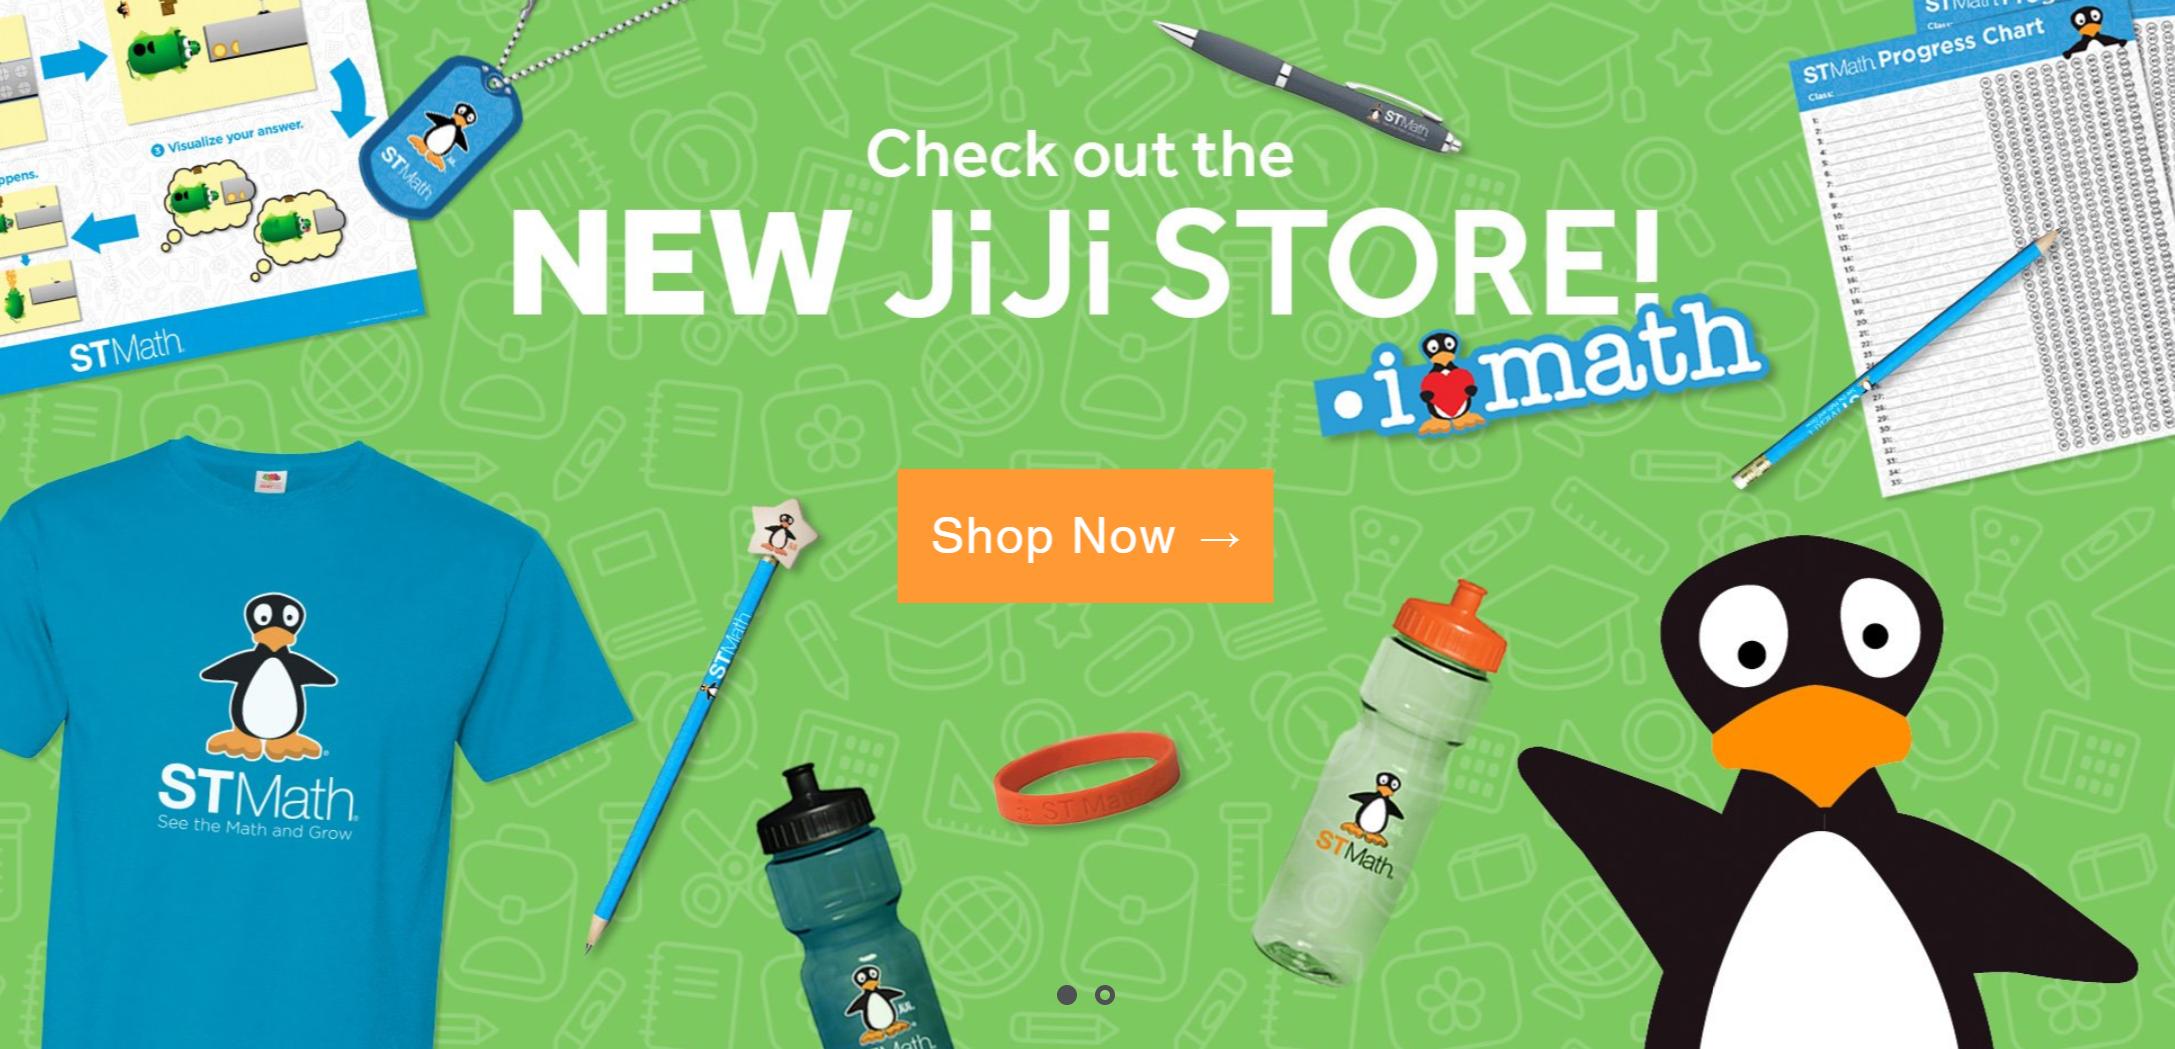 JiJi_Store